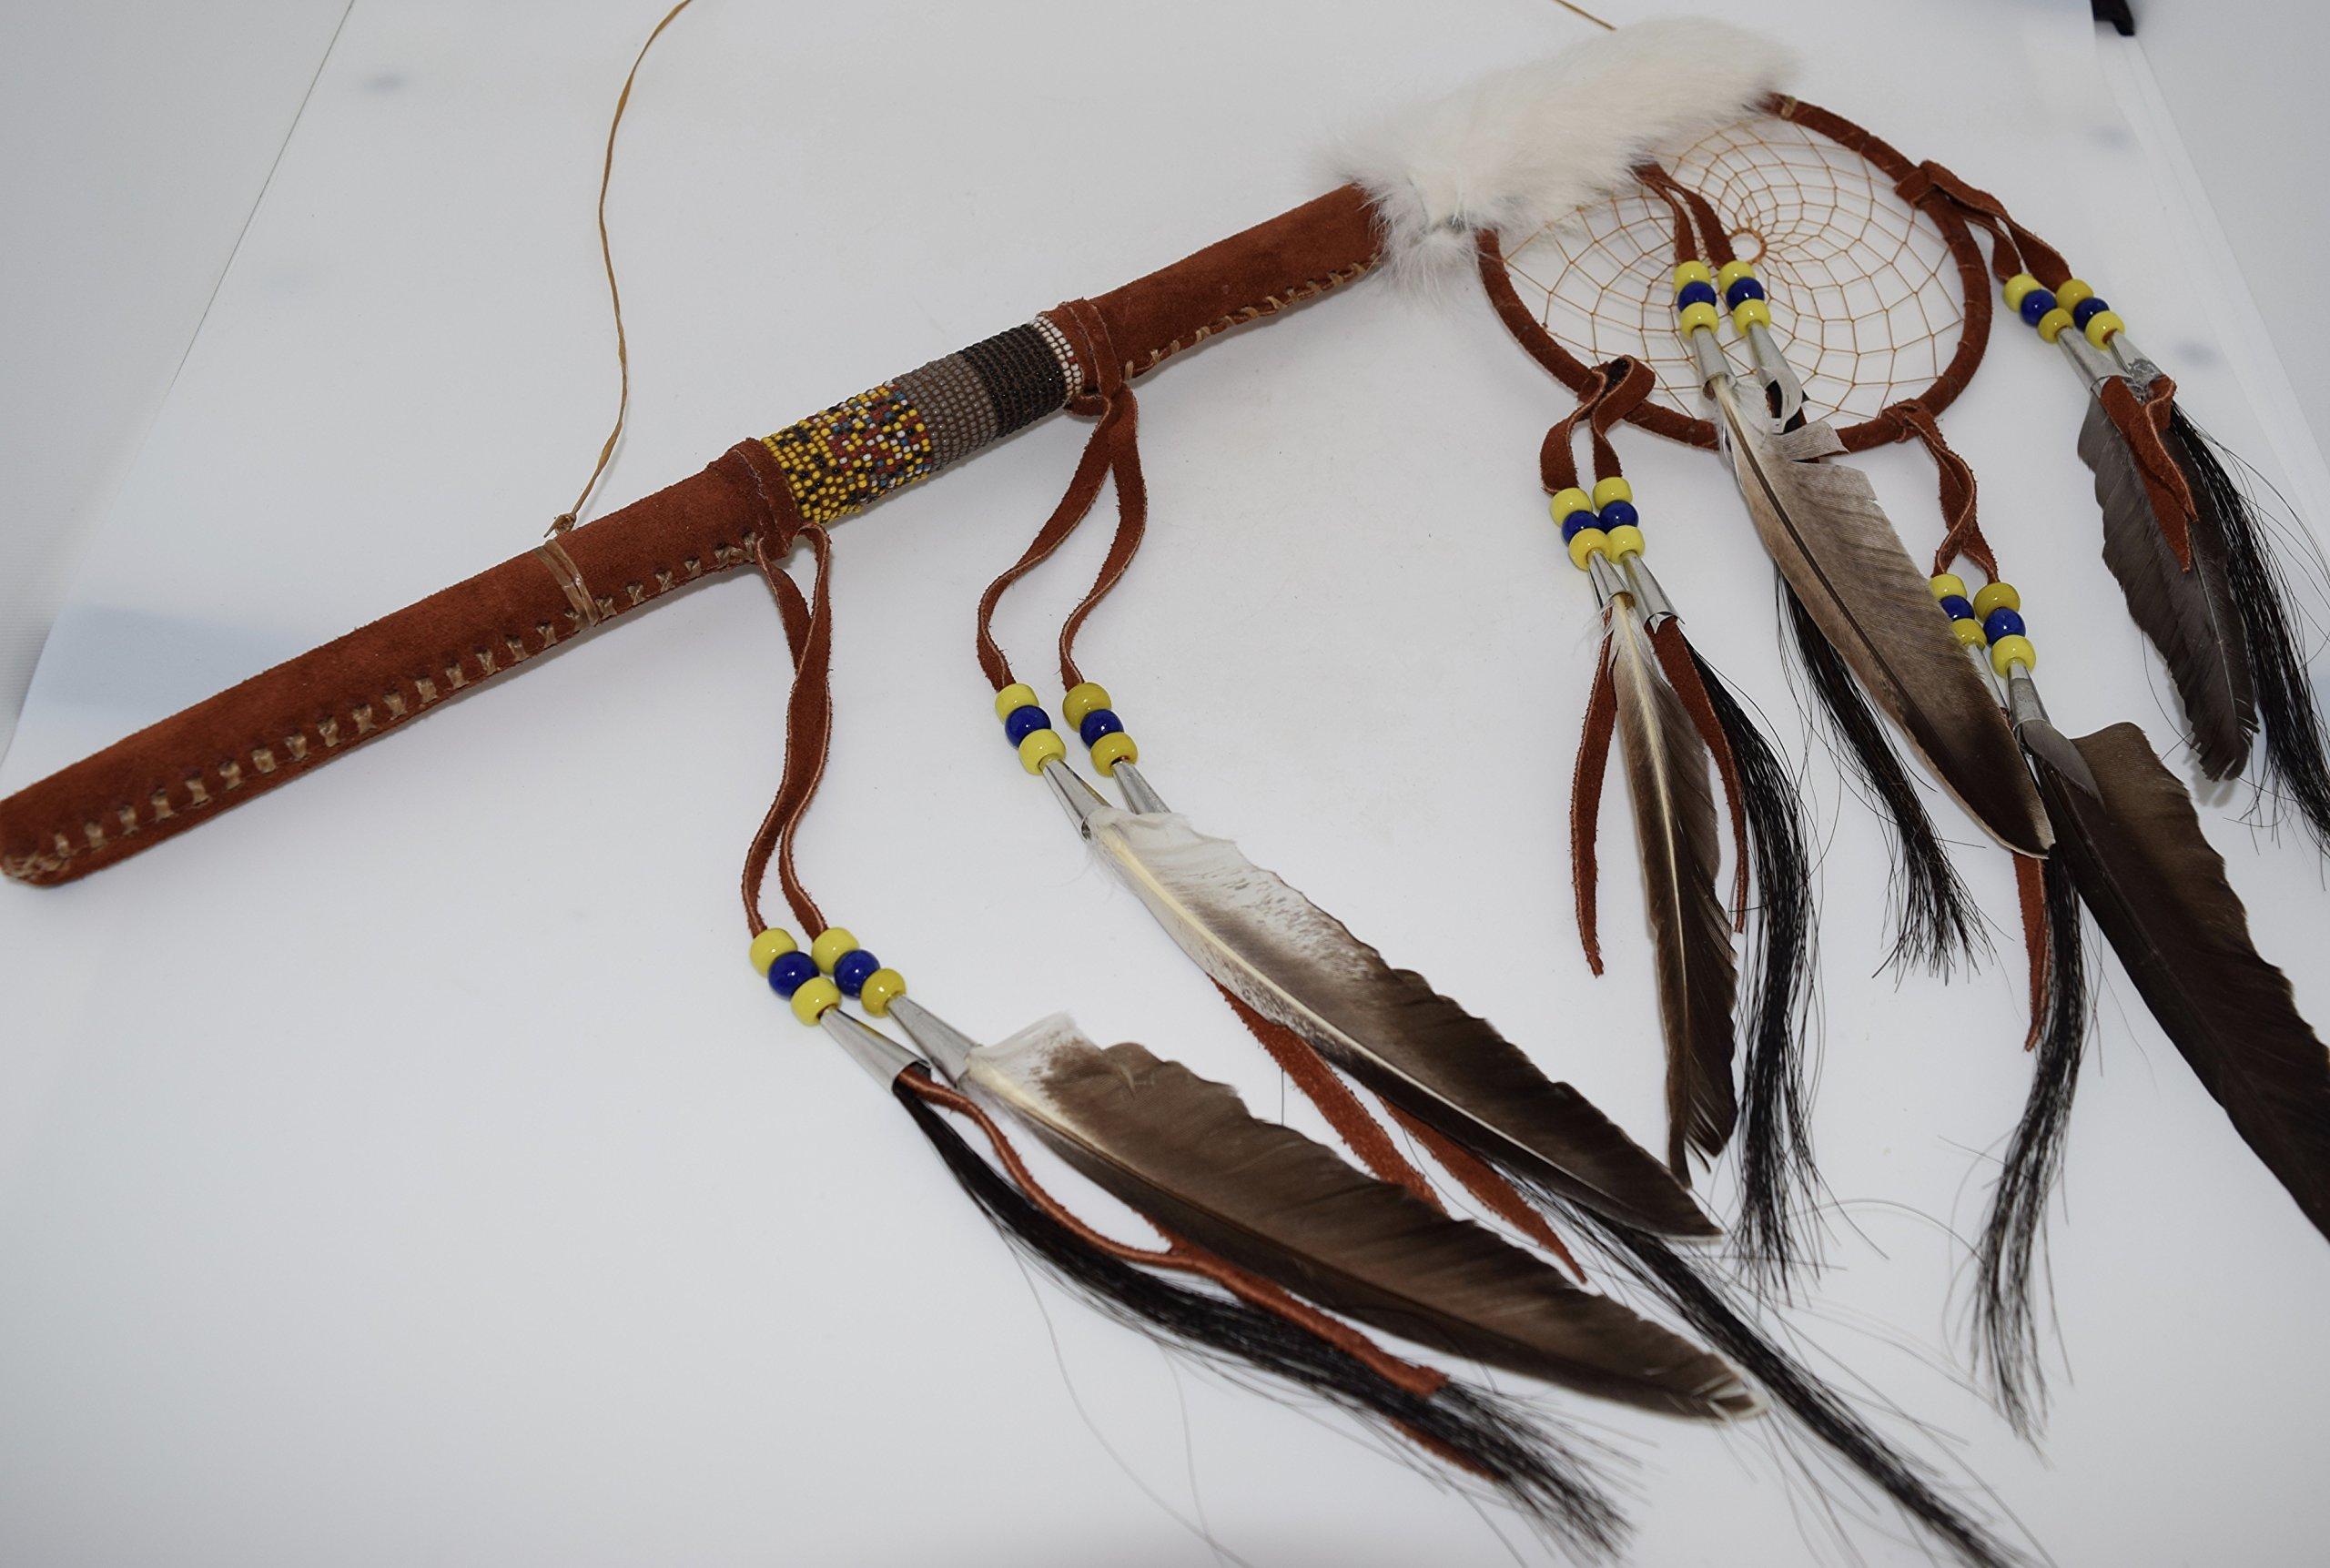 Genuine Handmade Beaded Dreamcatcher Dance Stick Wall Hanging by Kachina Country USA (Image #3)